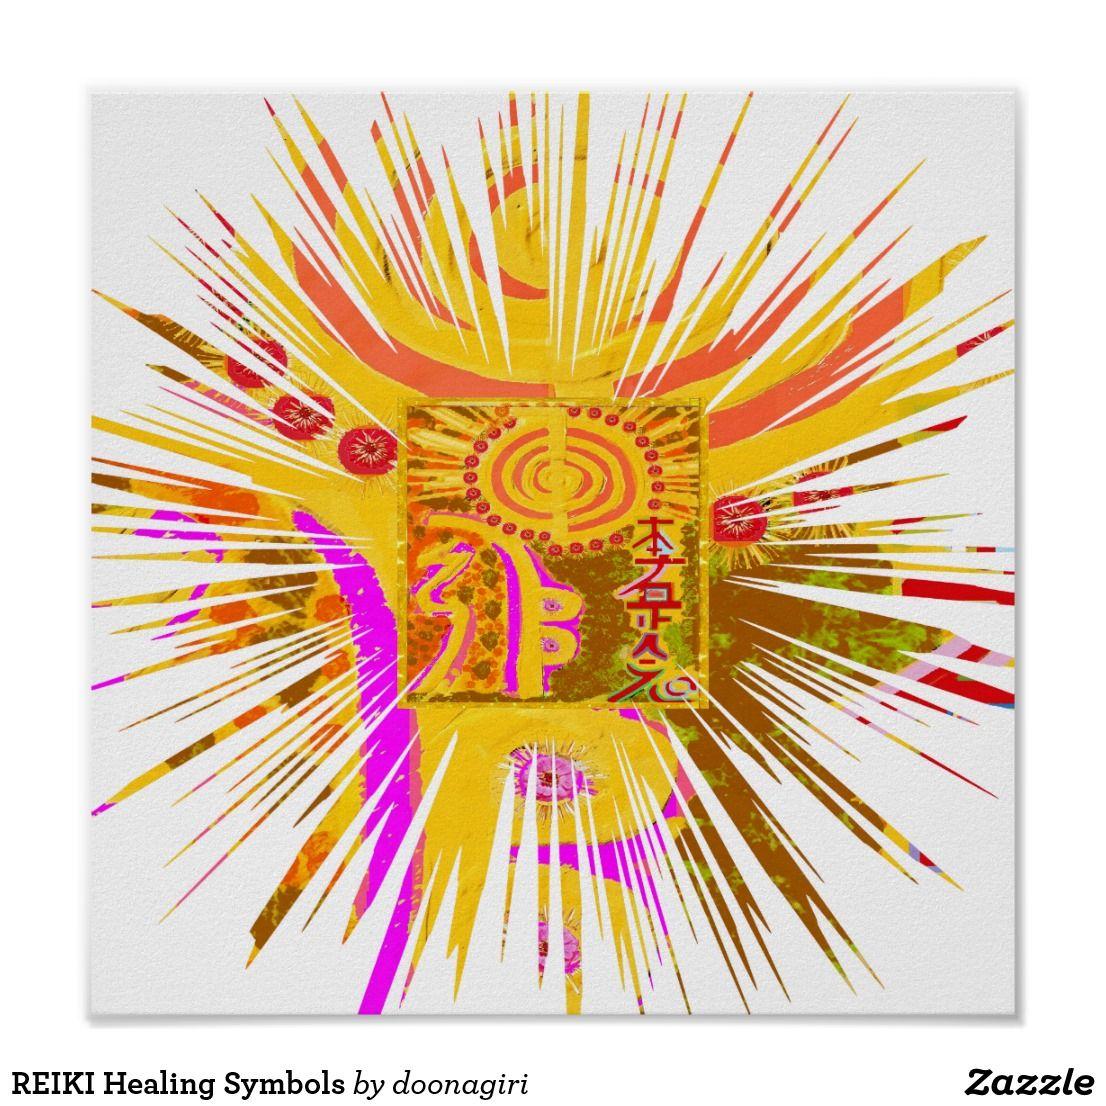 Healing symbols poster reiki healing symbols poster biocorpaavc